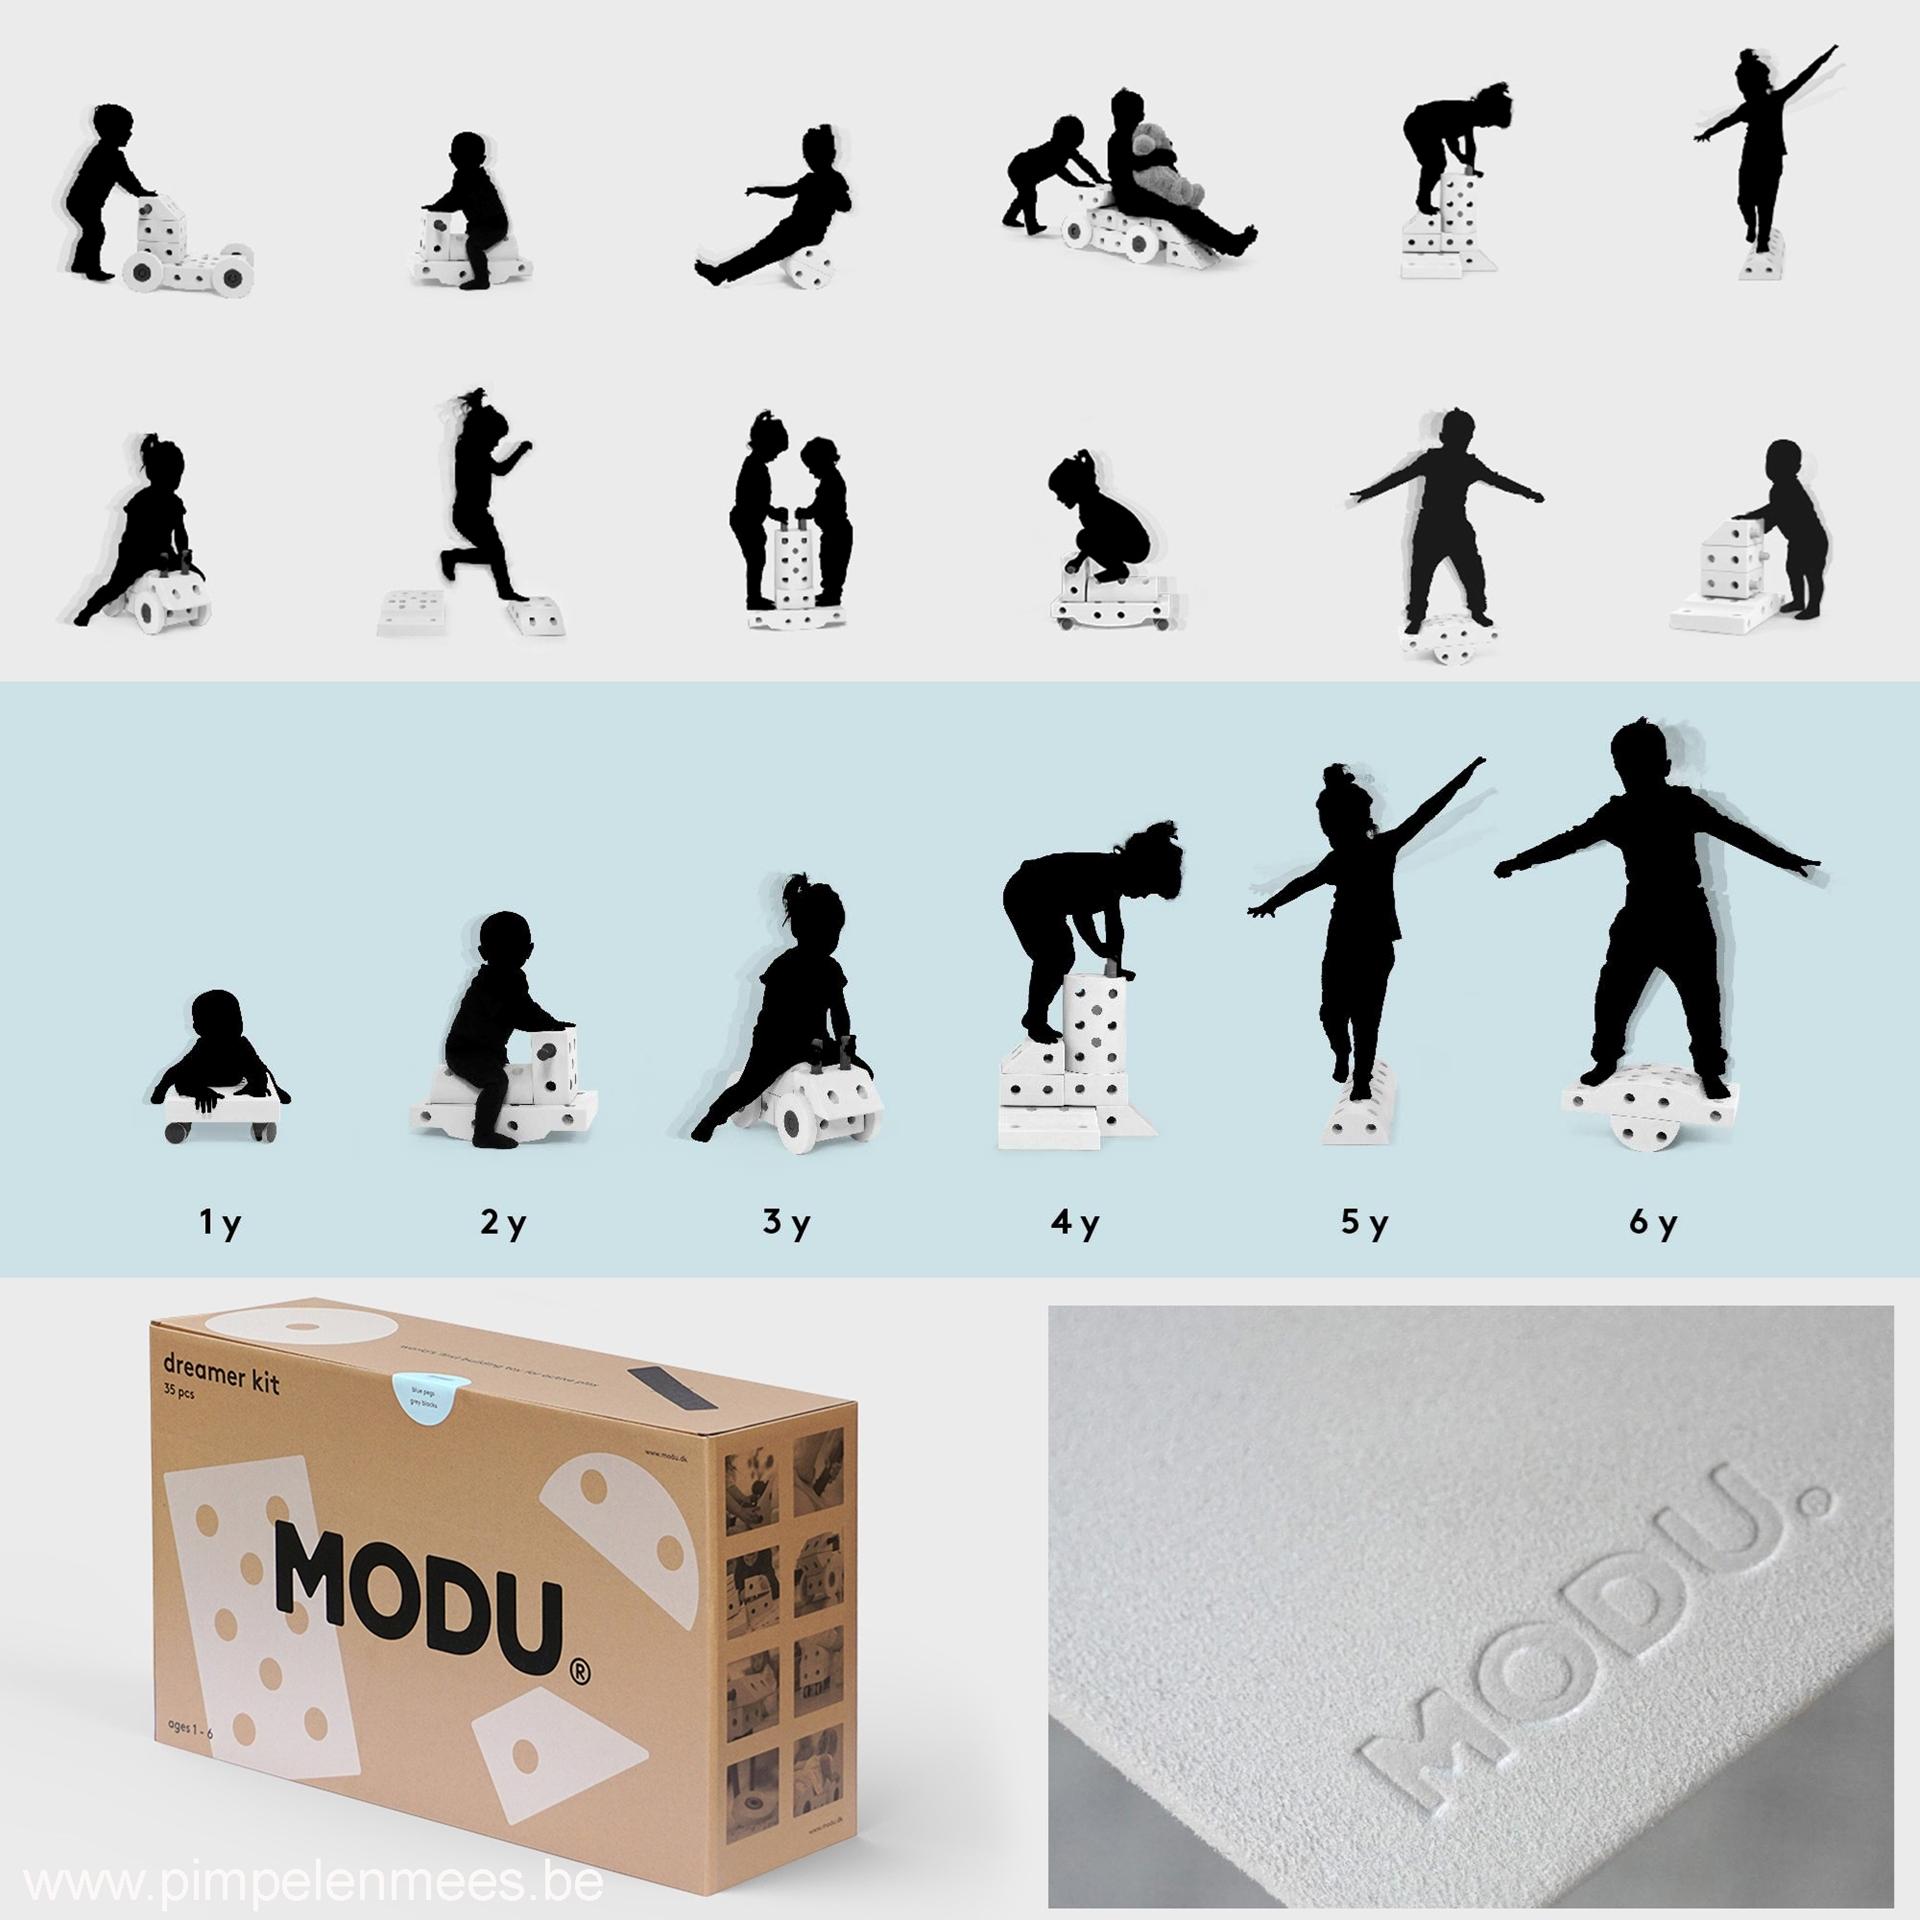 Modu Toy dreamer kit